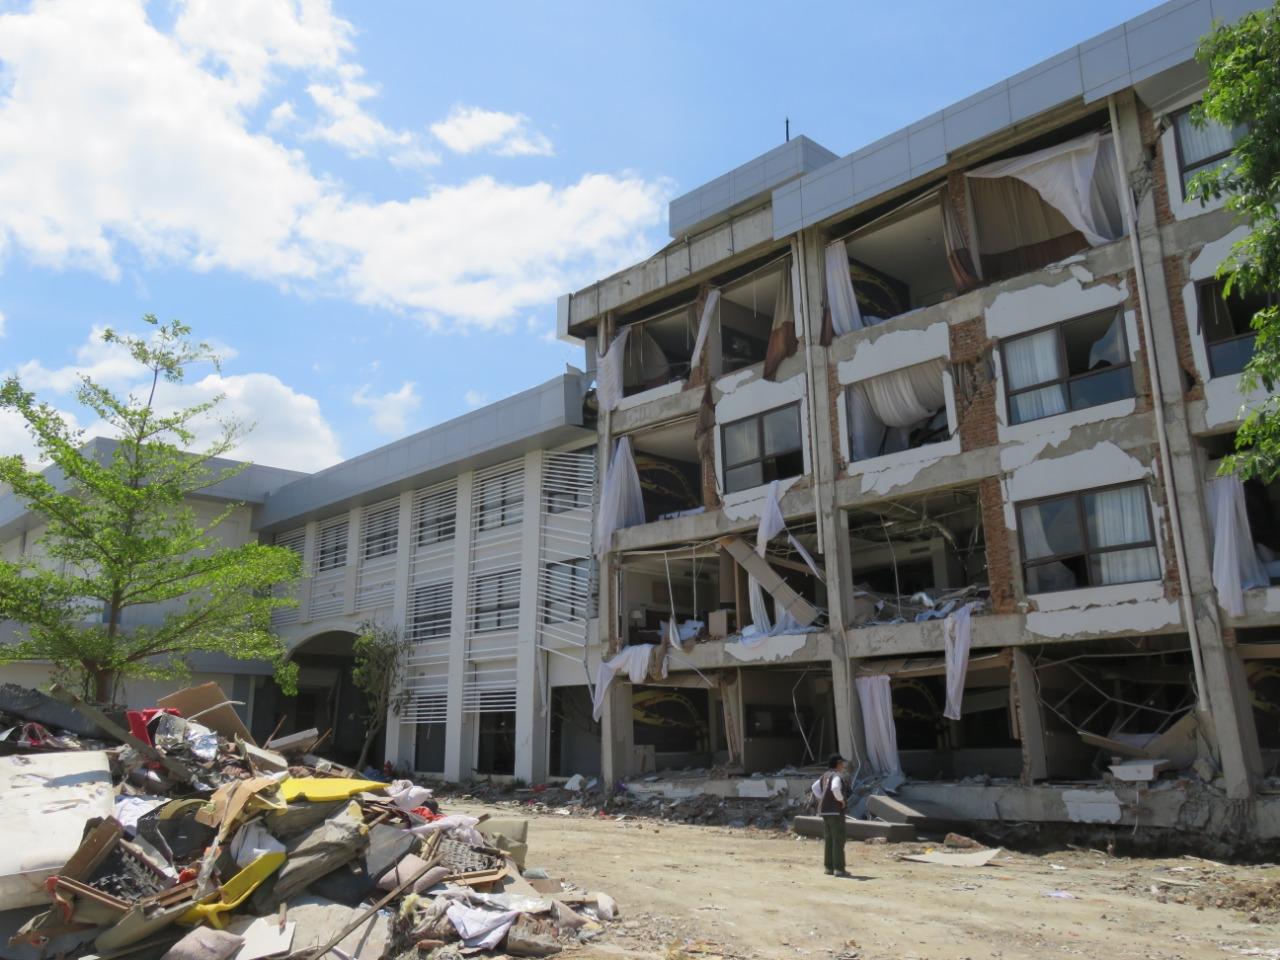 pelajaran-dari-gempa-palu-perlu-ditingkatkan-sosialisasi-standar-bangunan-tahan-gempa